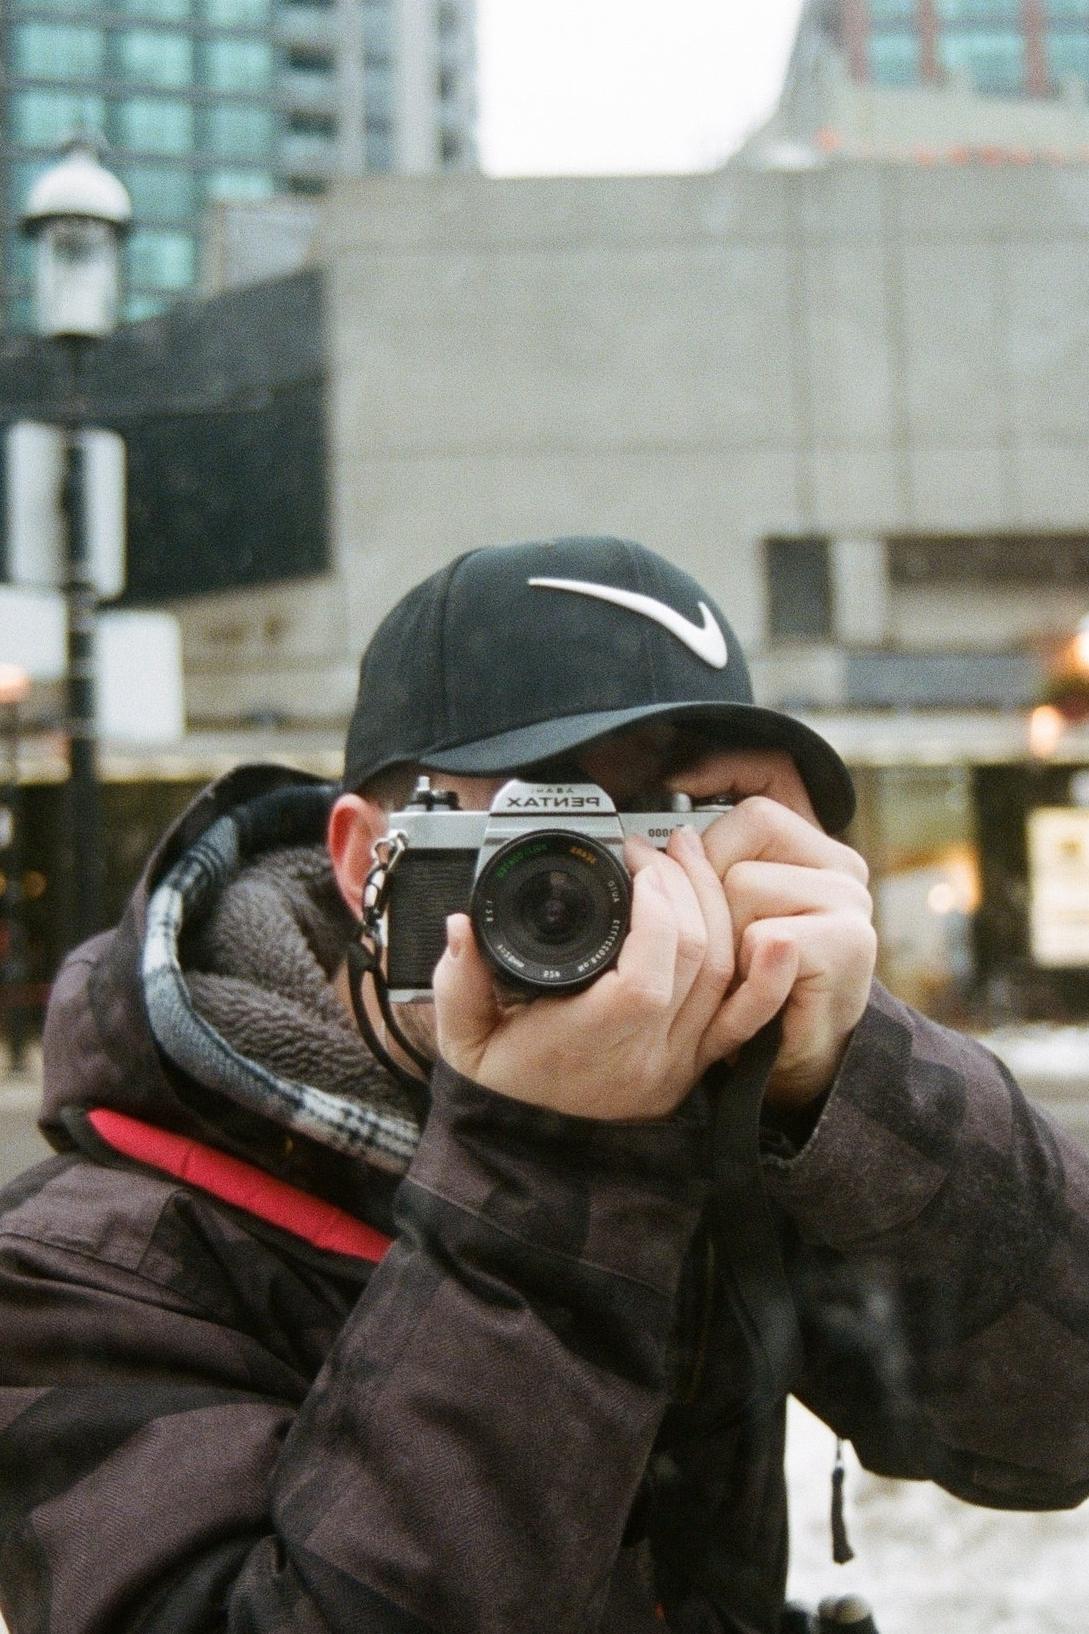 Marcus Rimmi - Imaging & Concept - Photography , Video Creation & Productionmarcus@rimmi.design